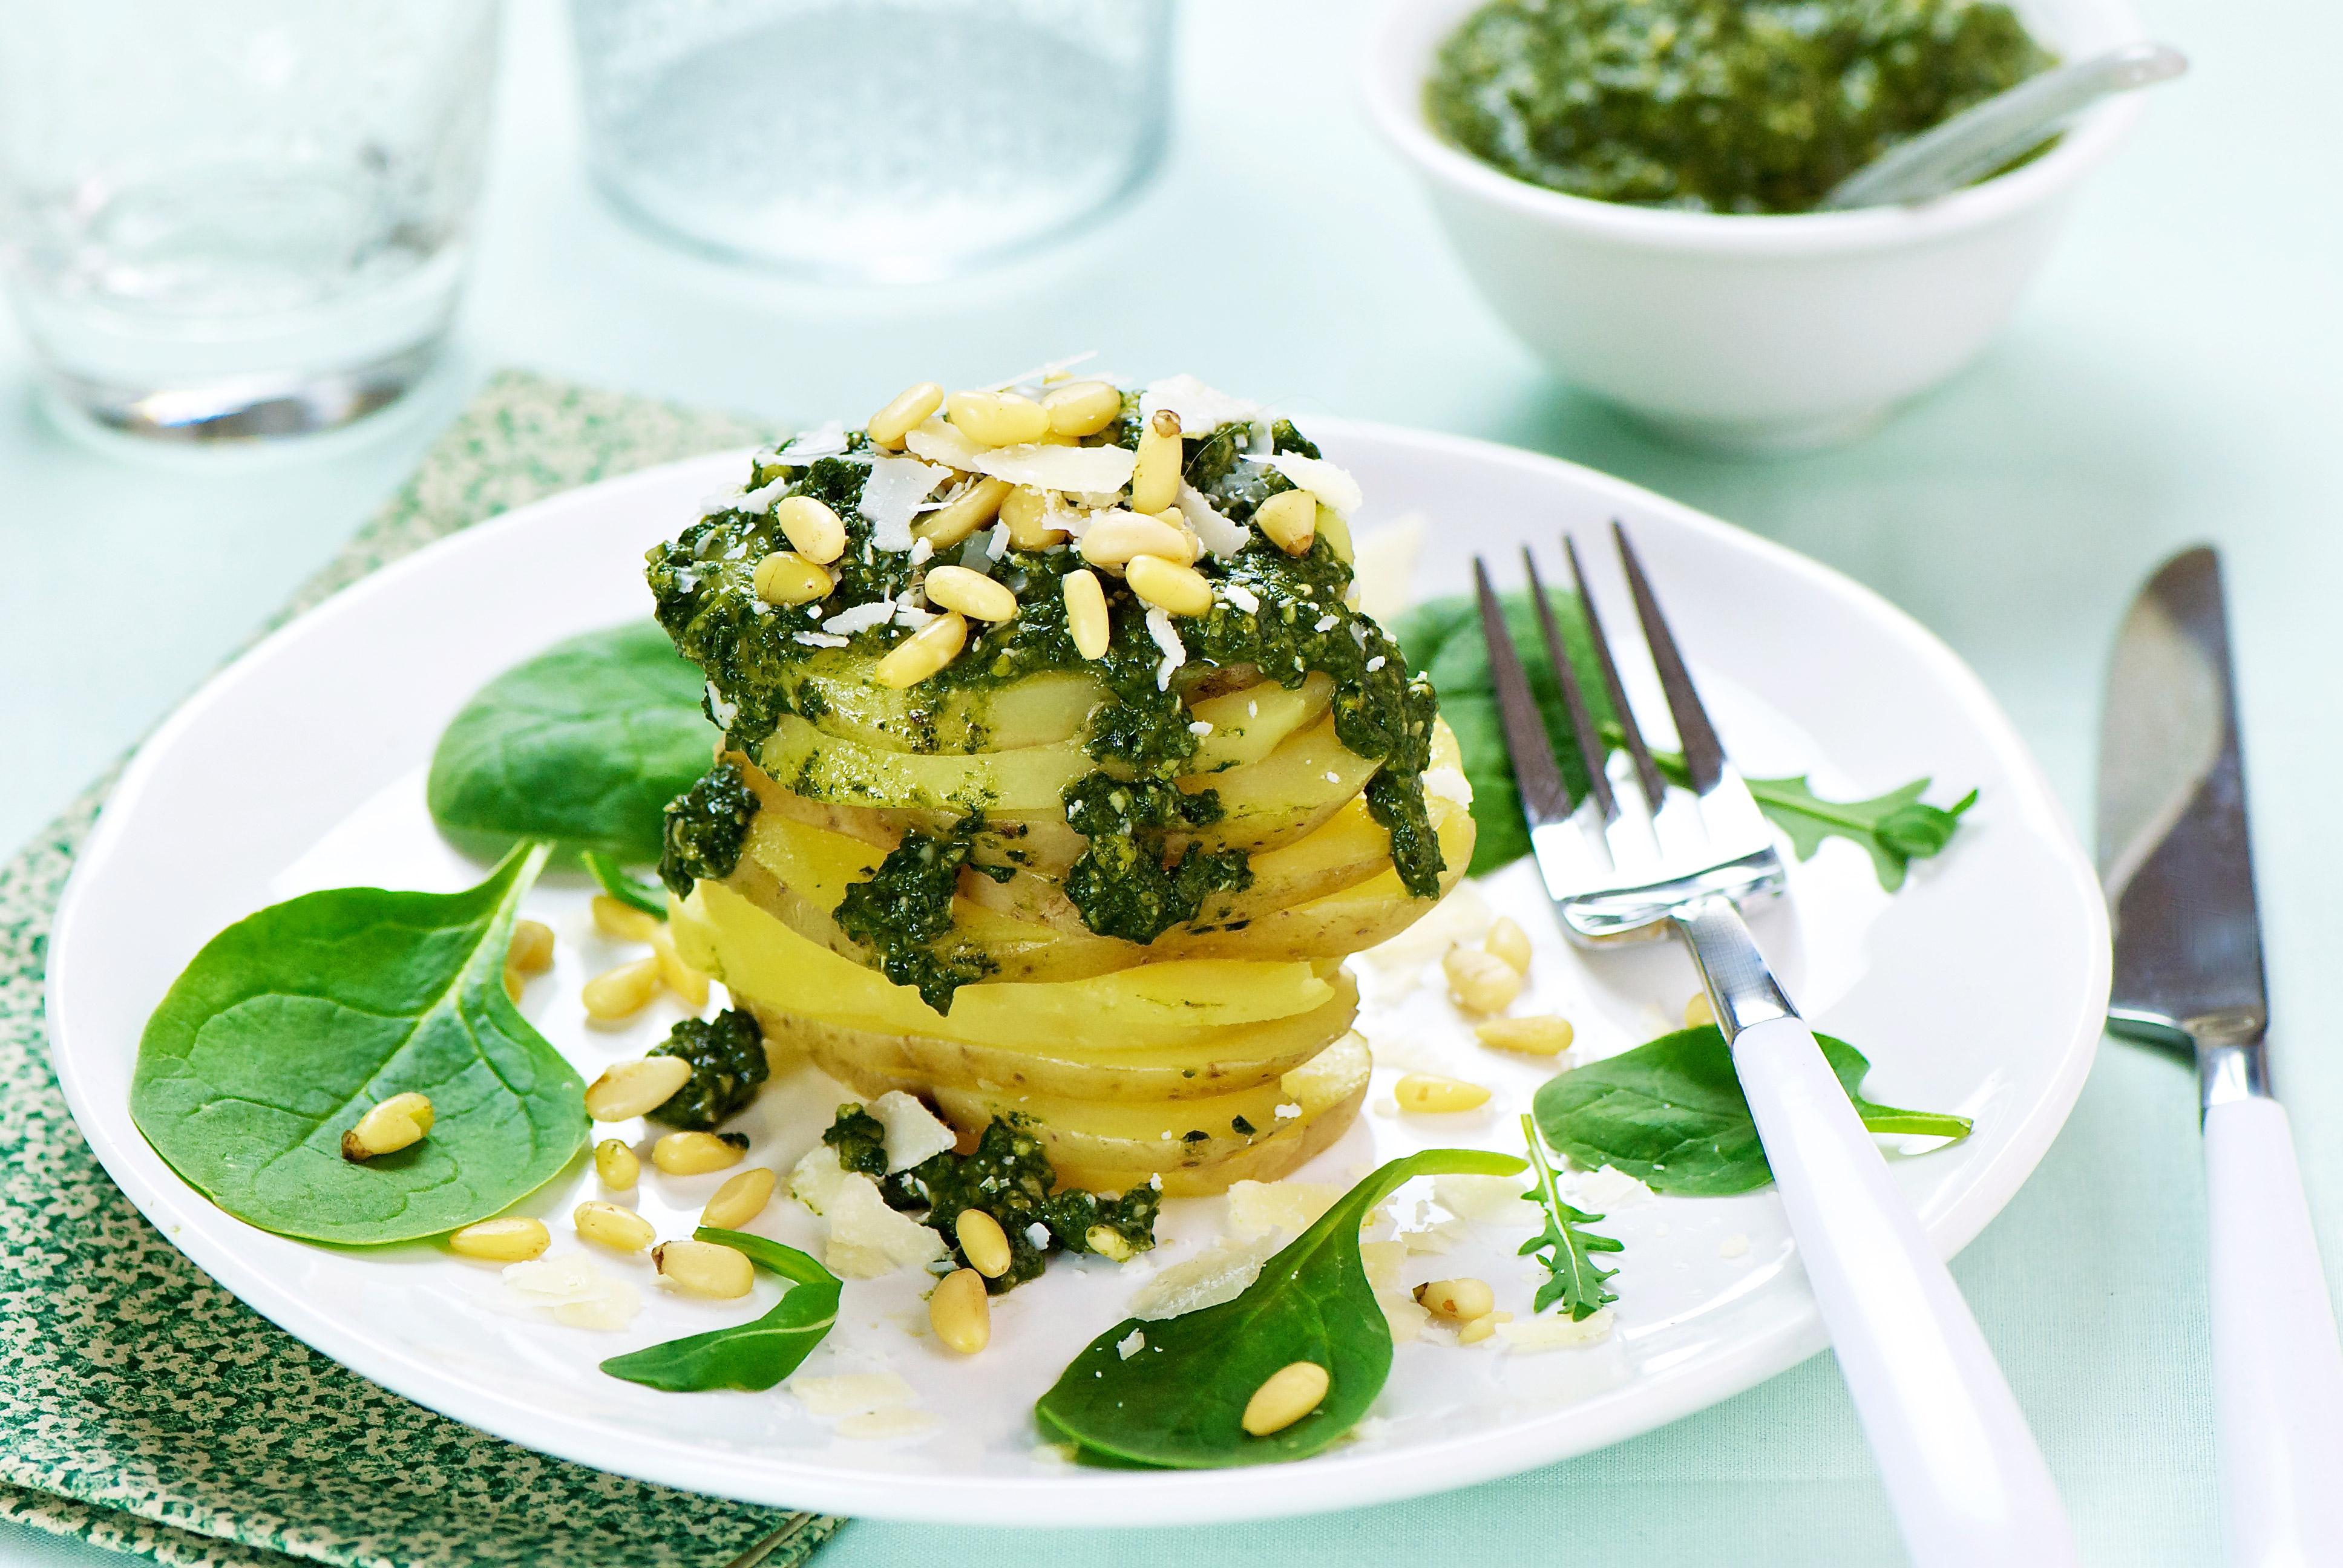 Salade de pommes de terre, sauce verte